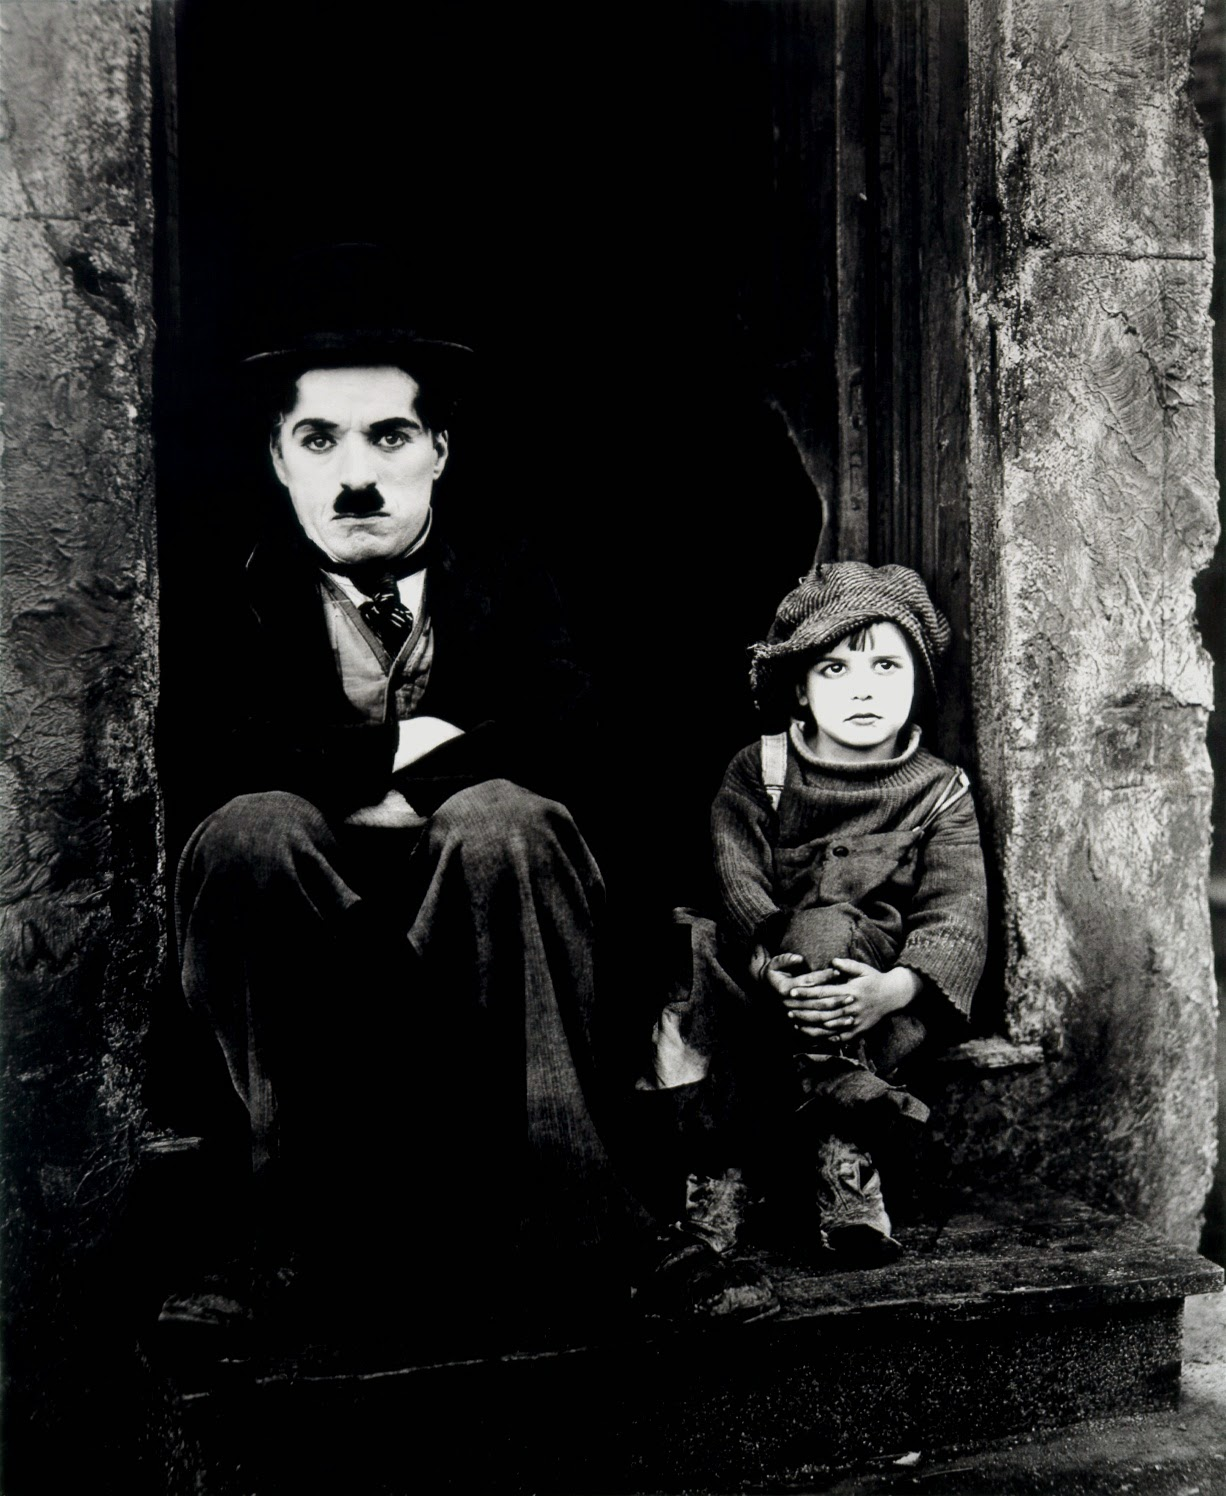 Chaplin, the